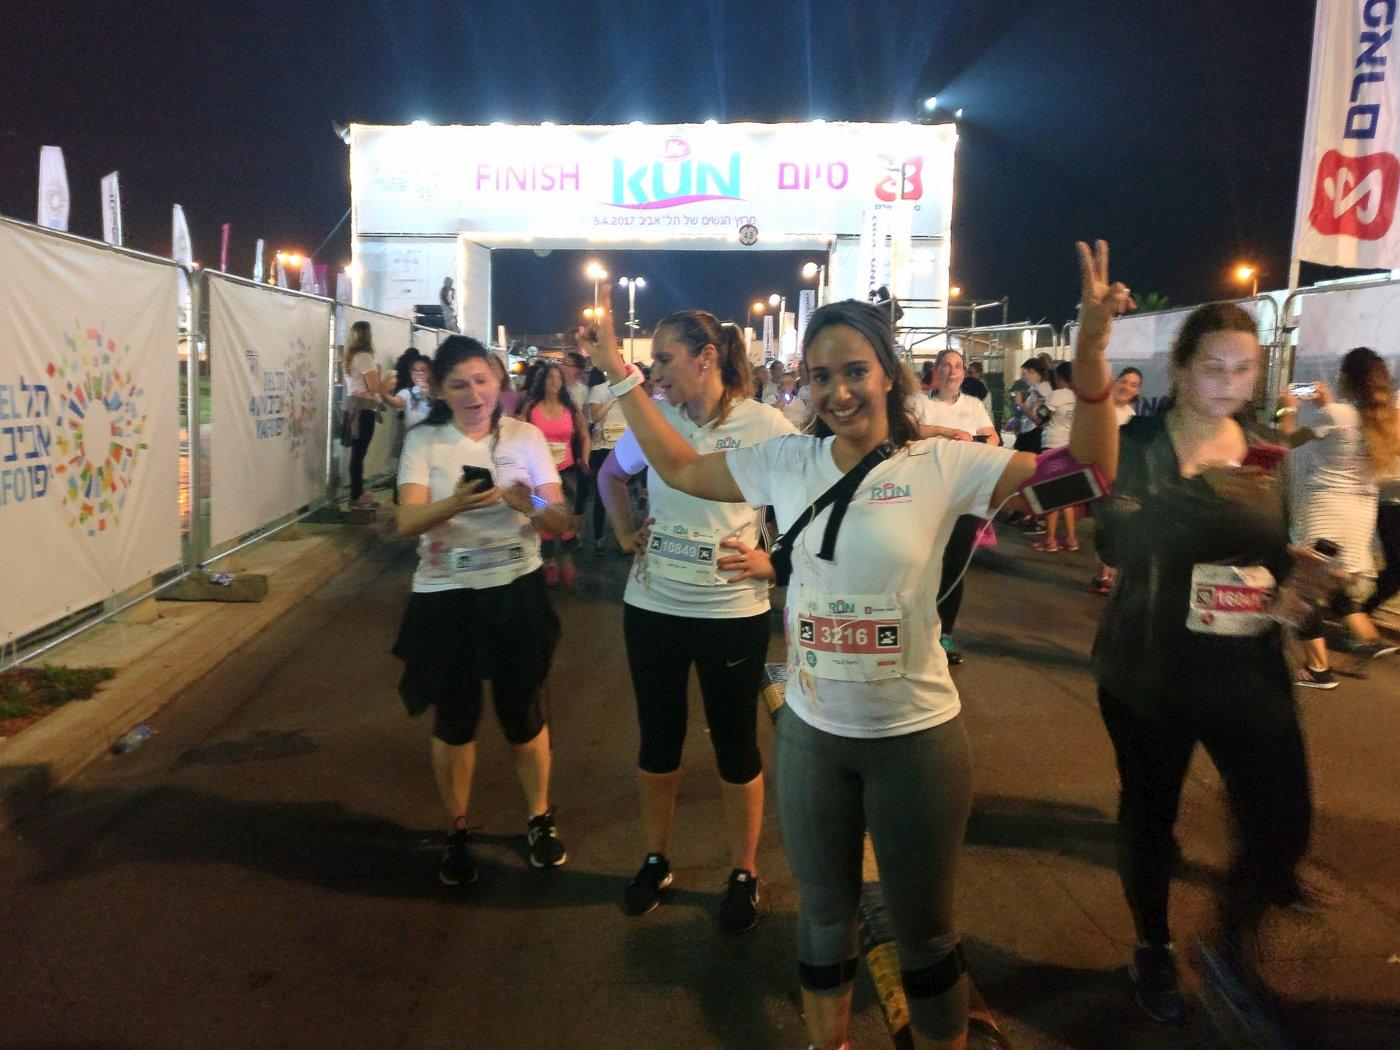 womens running race